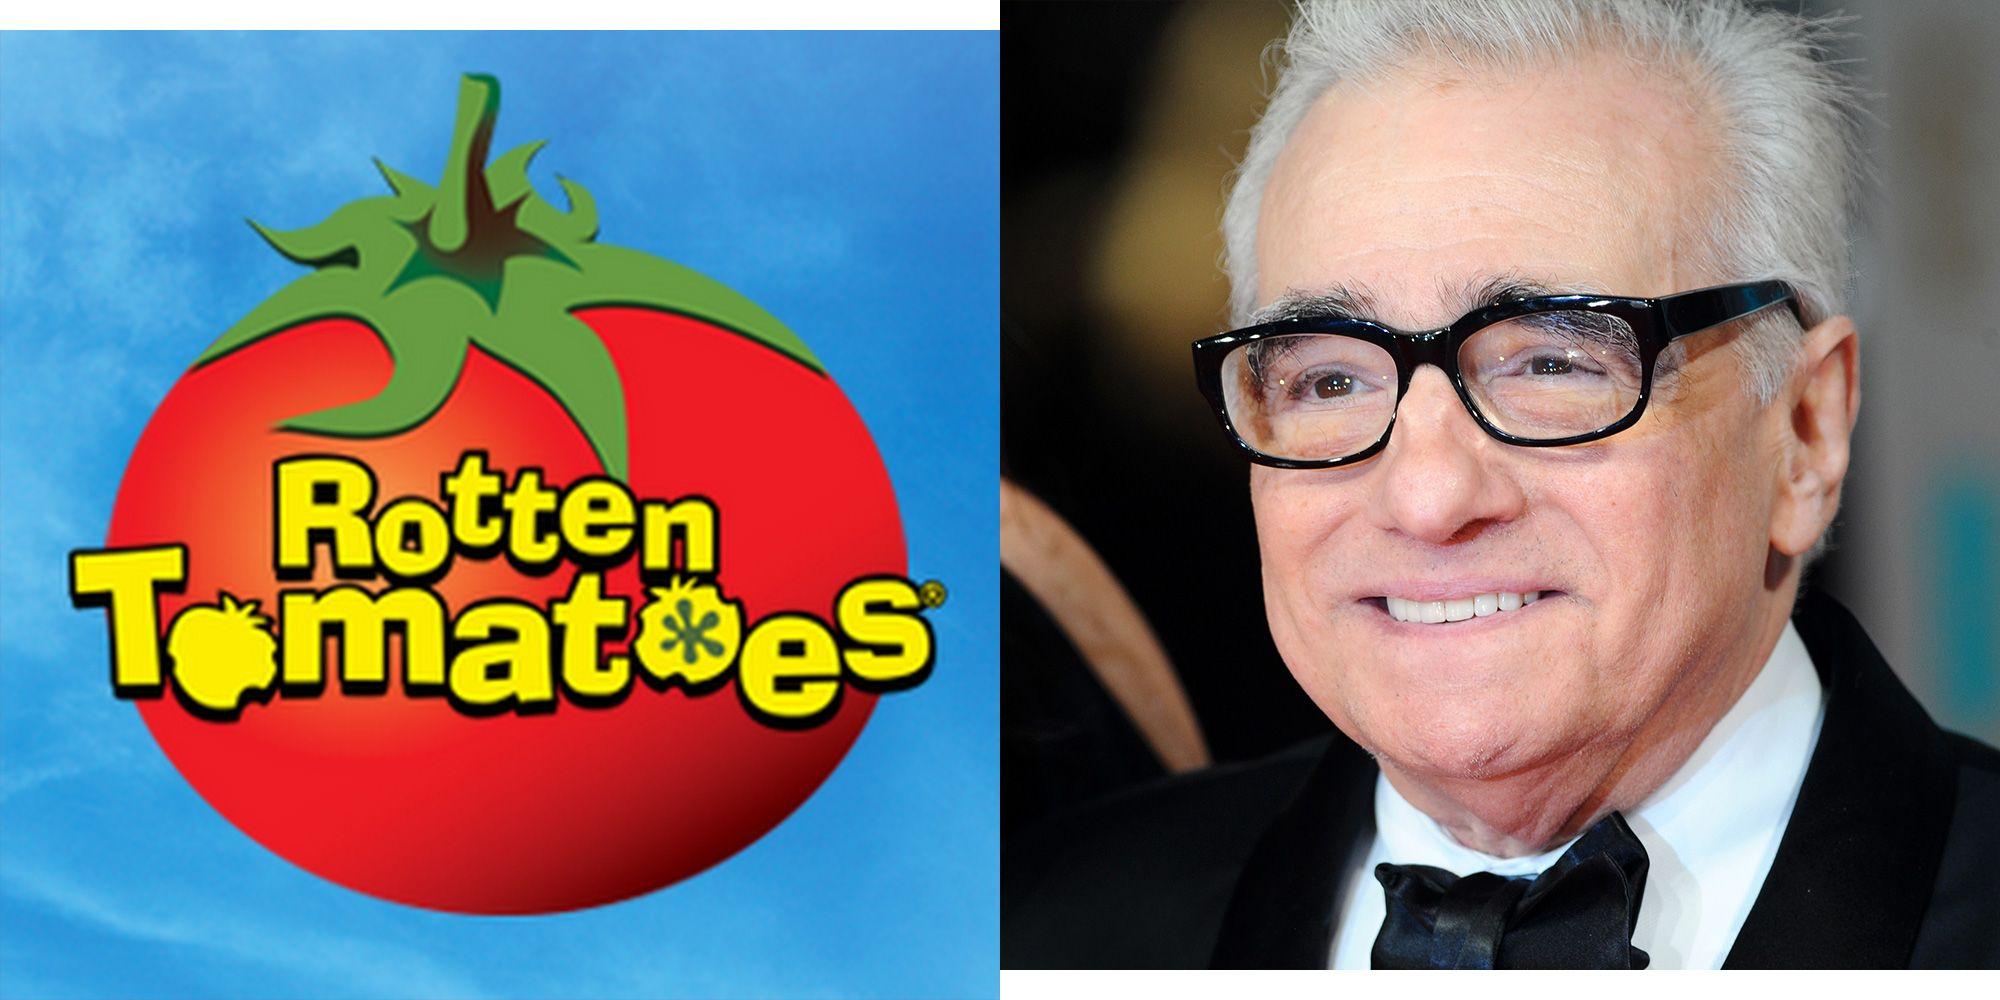 Martin Scorsese Slams Rotten Tomatoes in Op-Ed